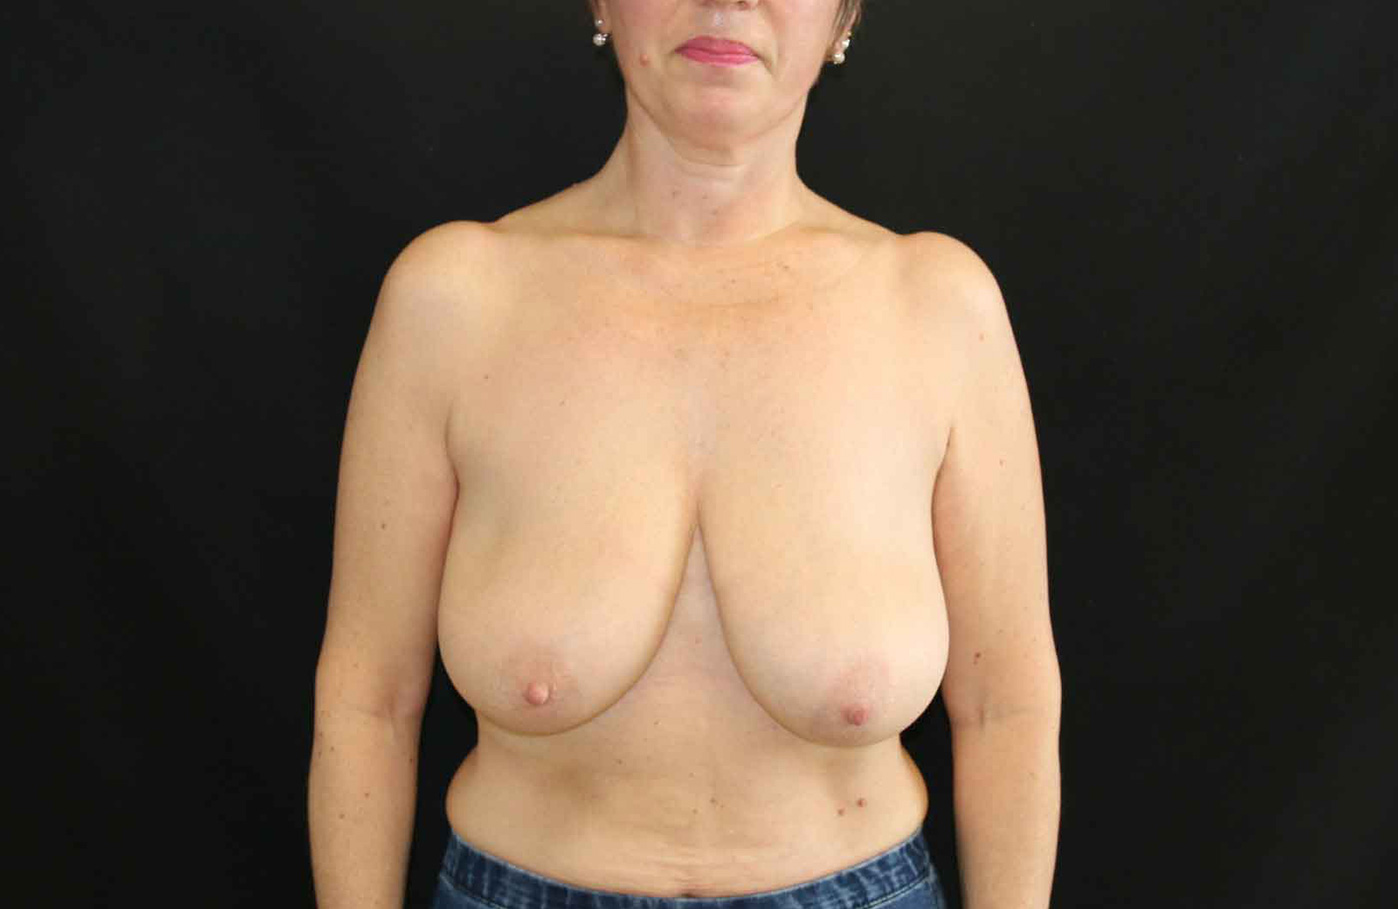 Avant chirurgie reduction mammaire